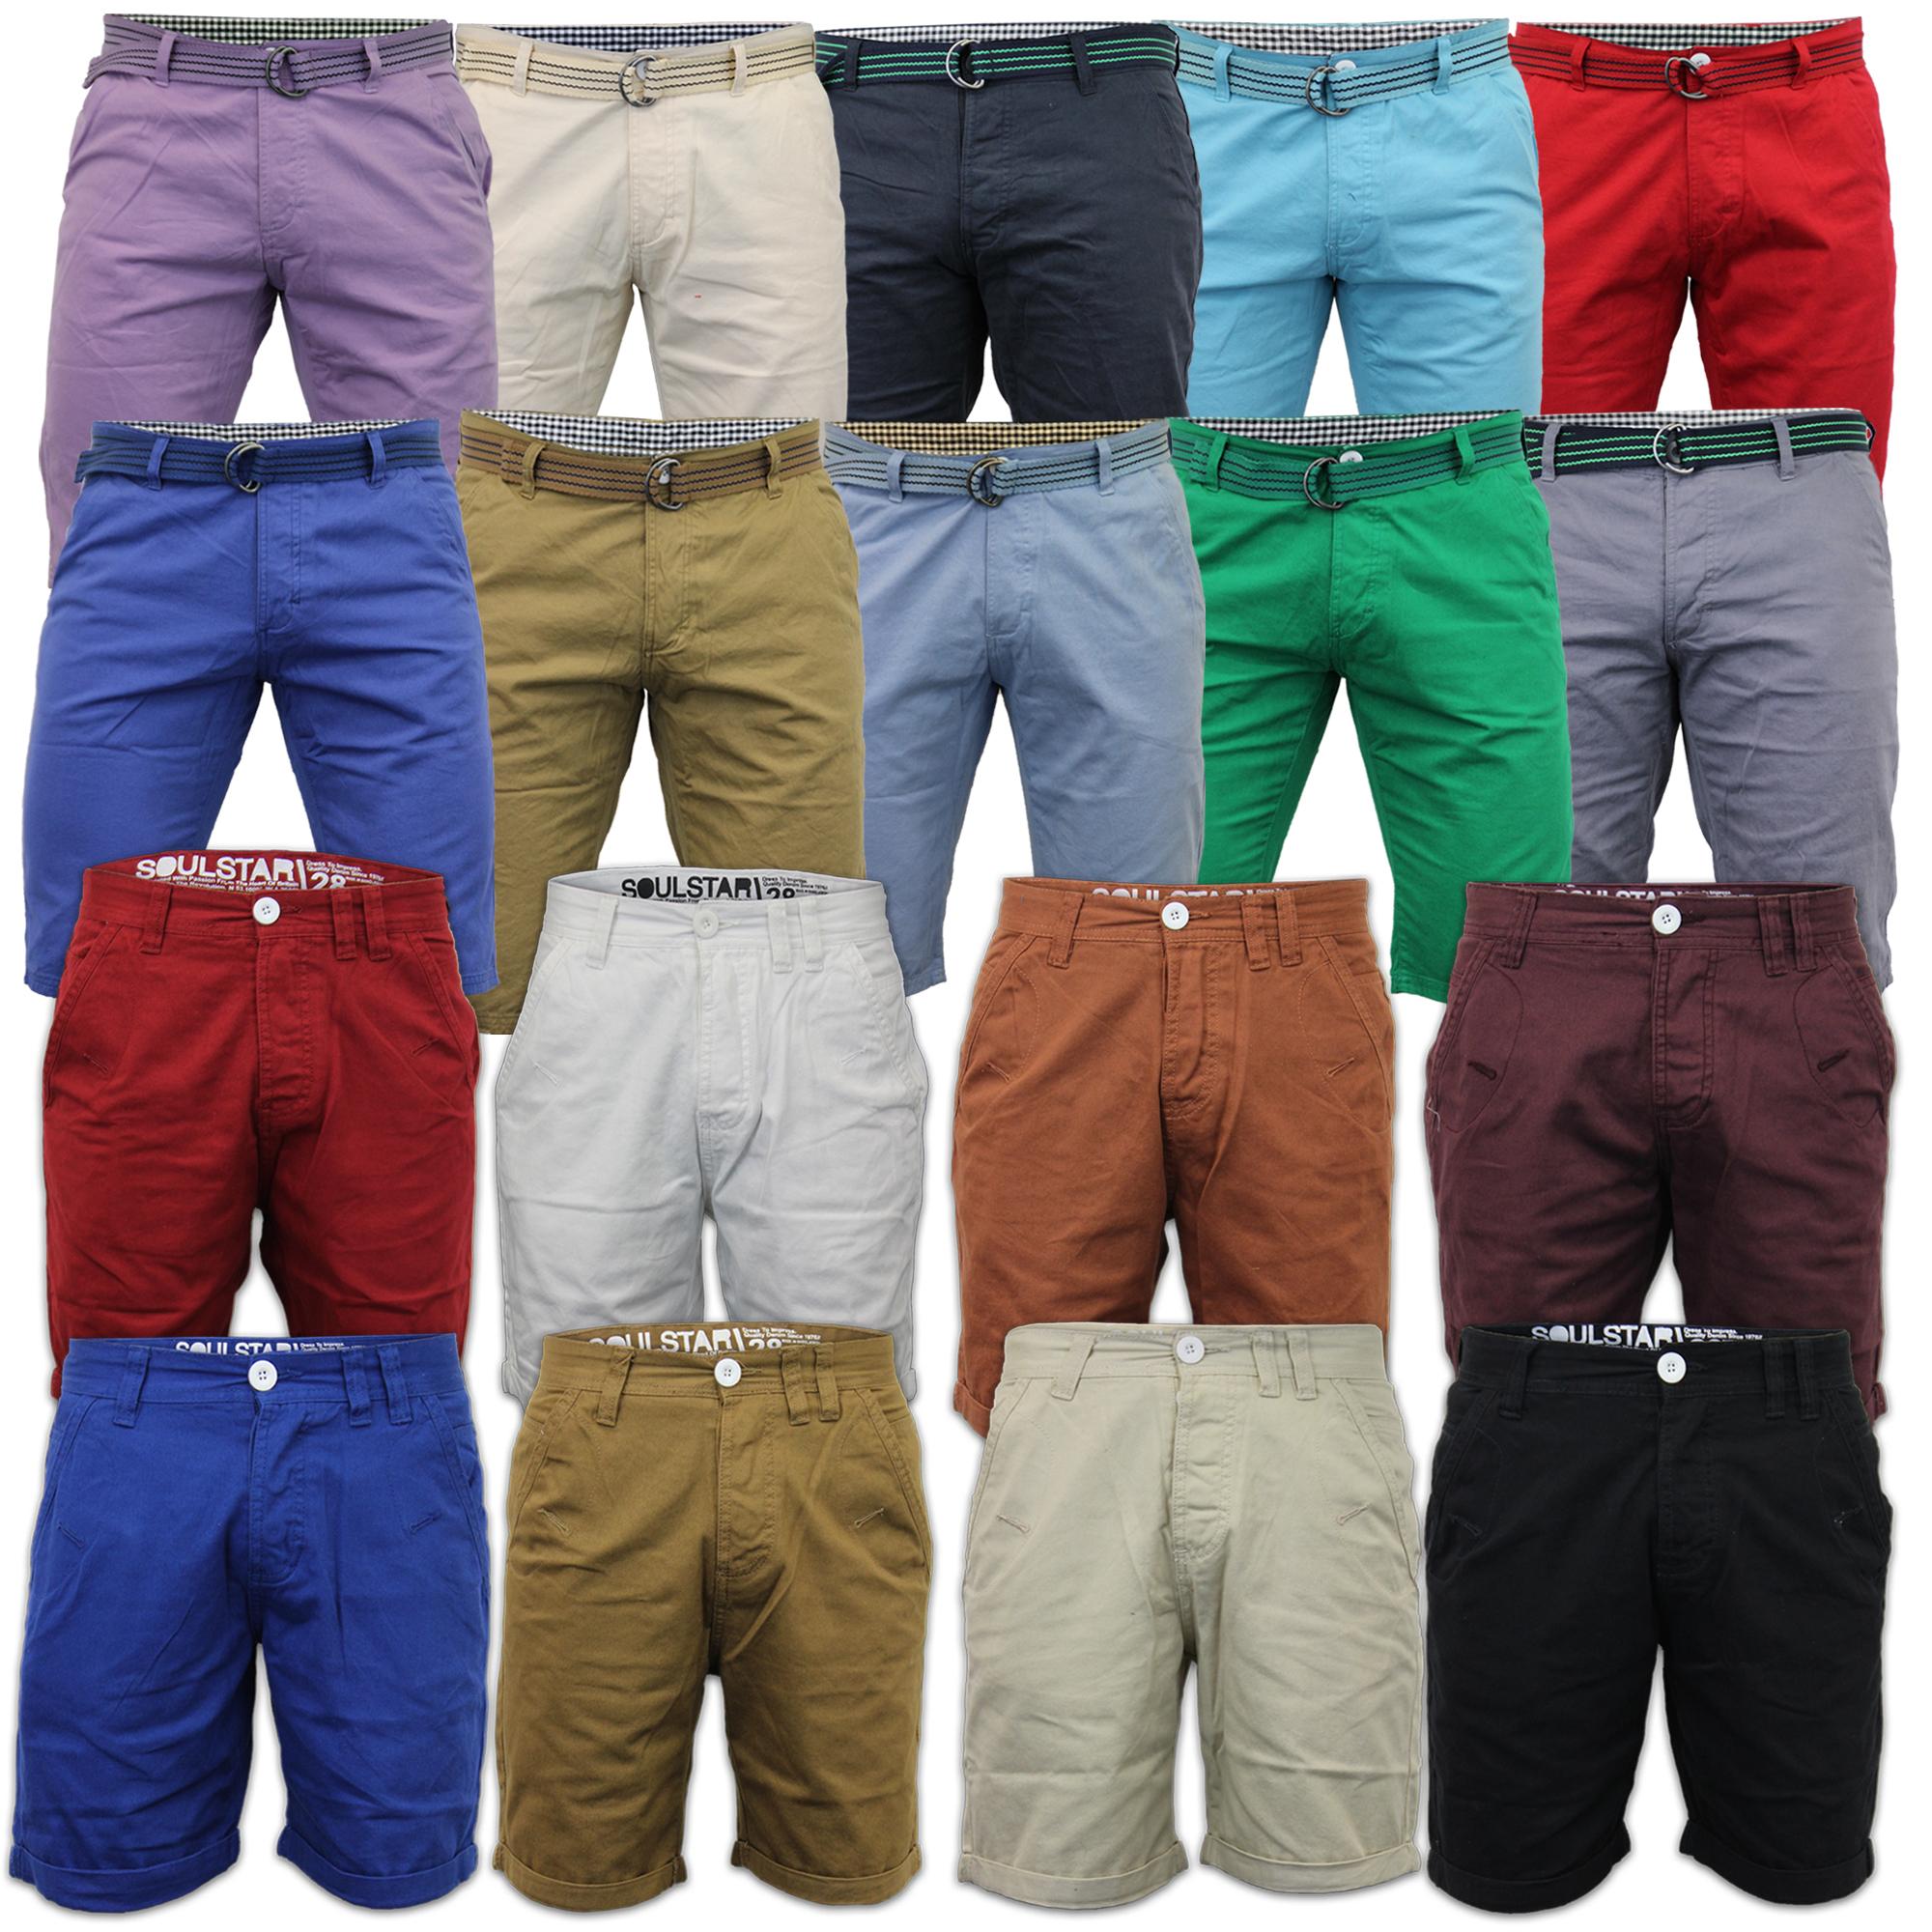 371ce28e863 Boys Shorts Soul Star Kids Chino Summer Half Pants Roll Up Cotton ...